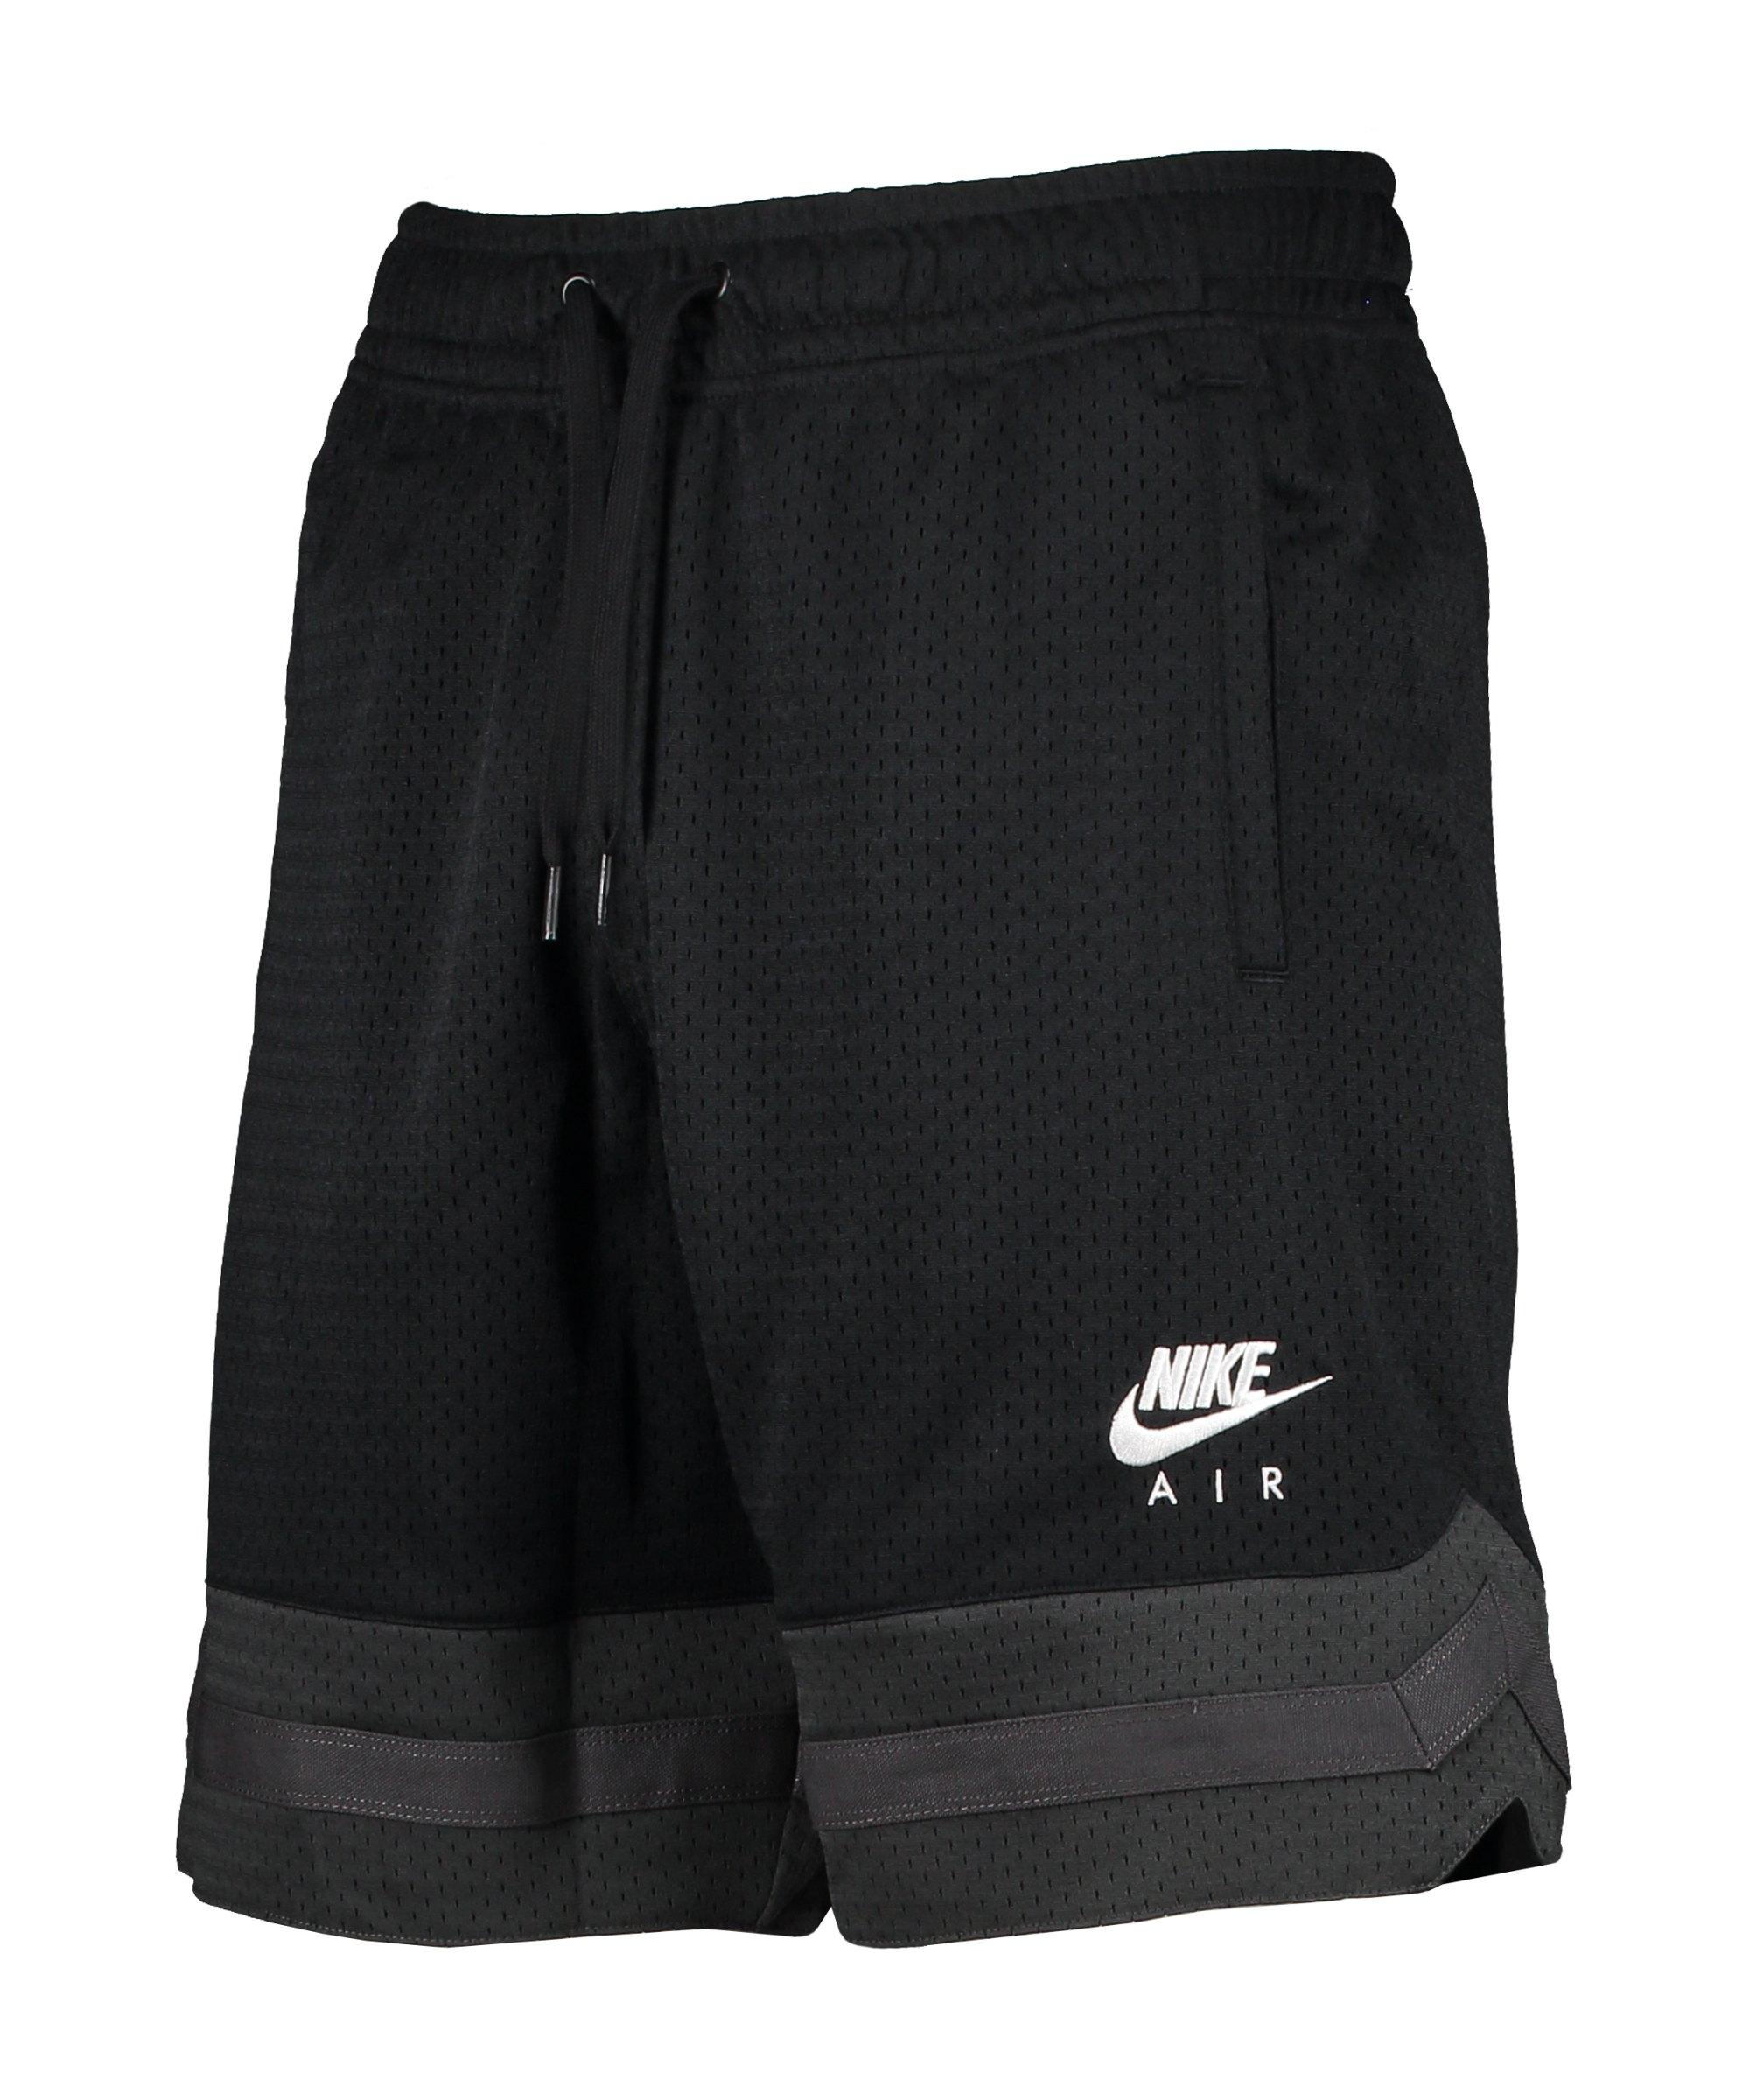 Nike Air Mesh Short Schwarz F010 - schwarz